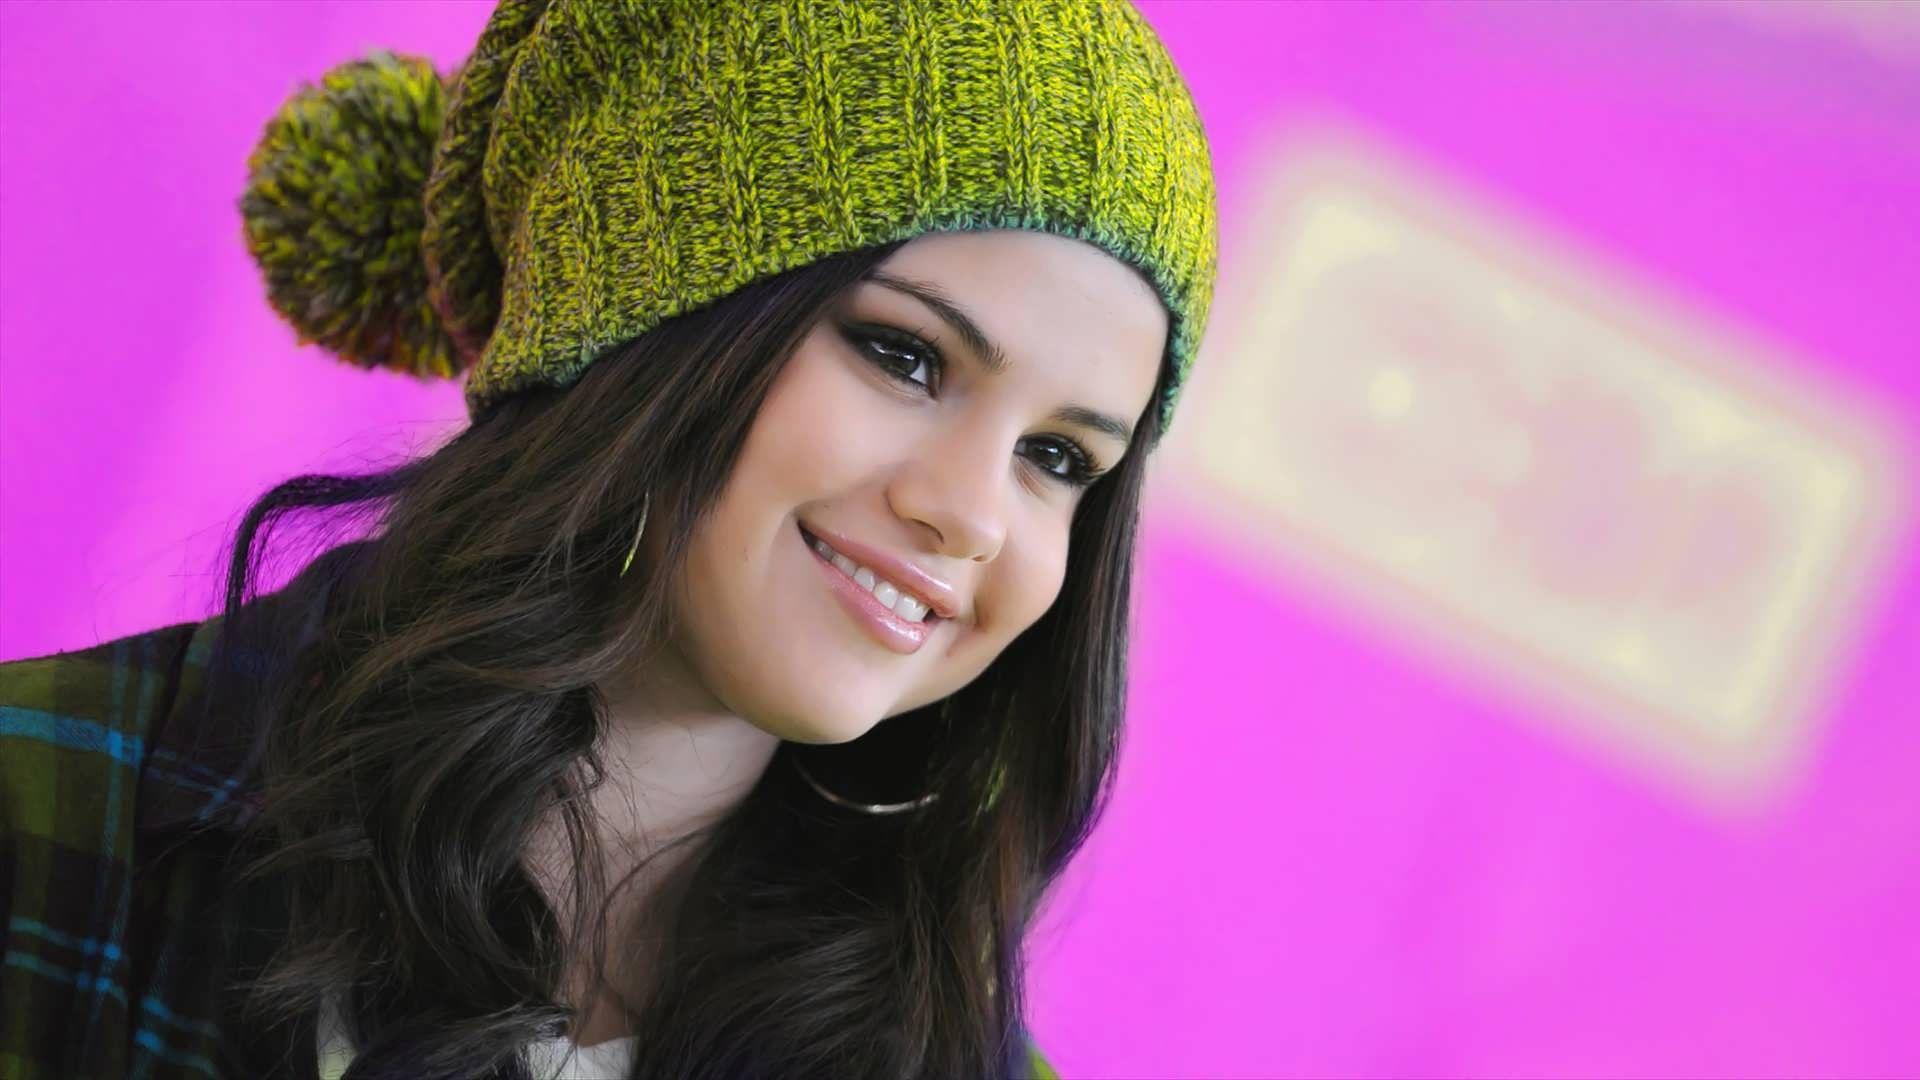 Gorgeous Selena Gomez Wallpapers Hd Selena Gomez Wallpaper Selena Gomez Selena Gomez Hd Wallpapers